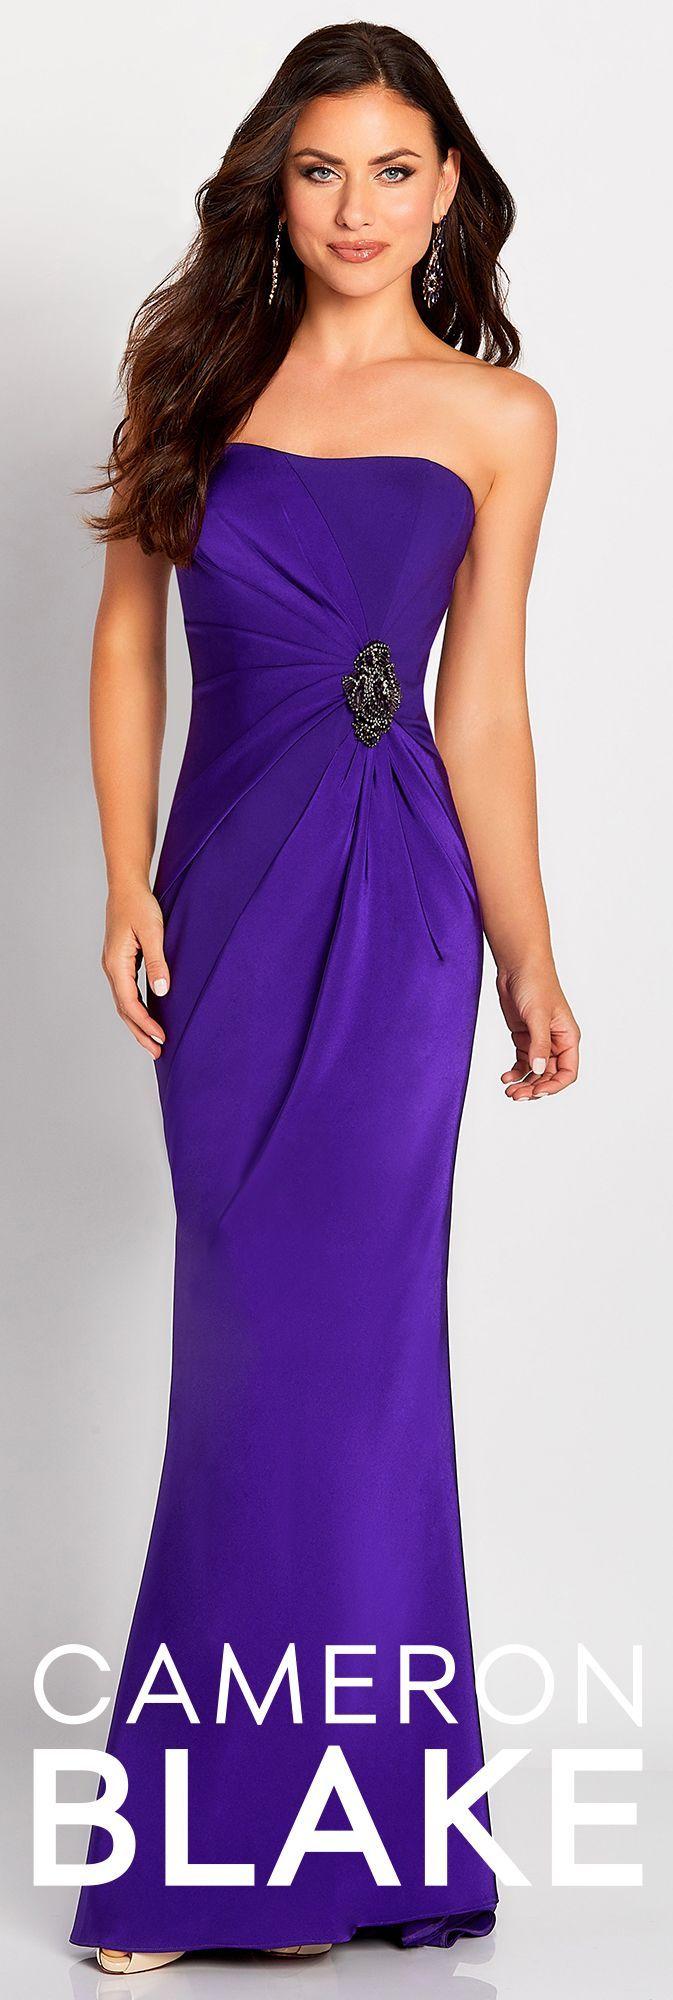 Cameron Blake Style 119650 Stretch Evening Dress Evening Dresses Dresses [ 2000 x 673 Pixel ]